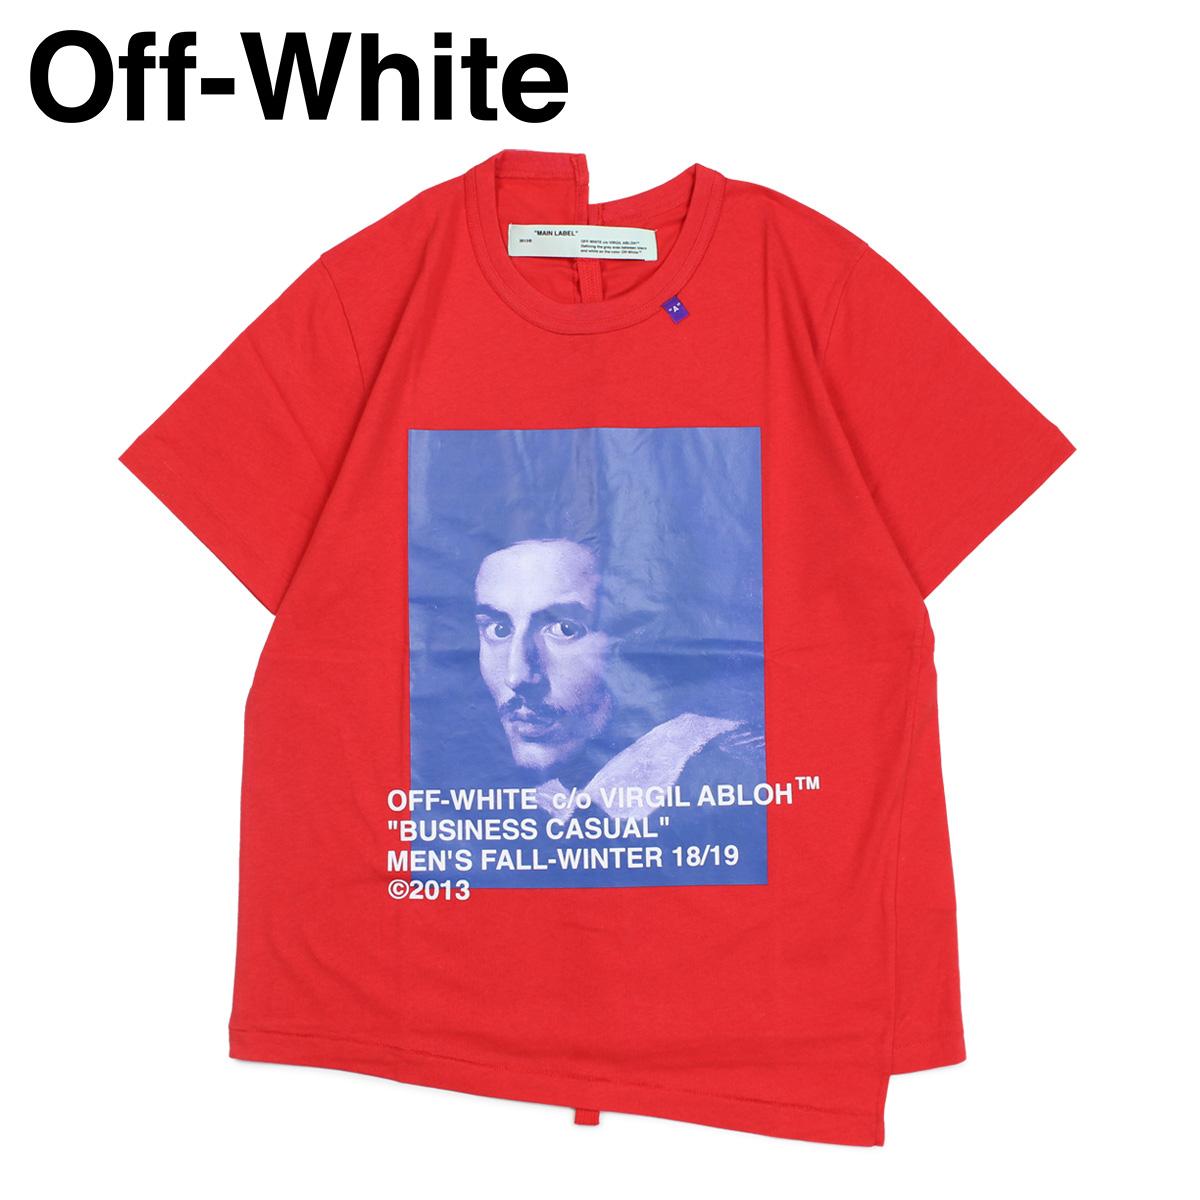 Off-white Off-white T-shirt short sleeves men BERNINI PRINT T-SHIRTS red  OMAA032 185011 [11/19 Shinnyu load]